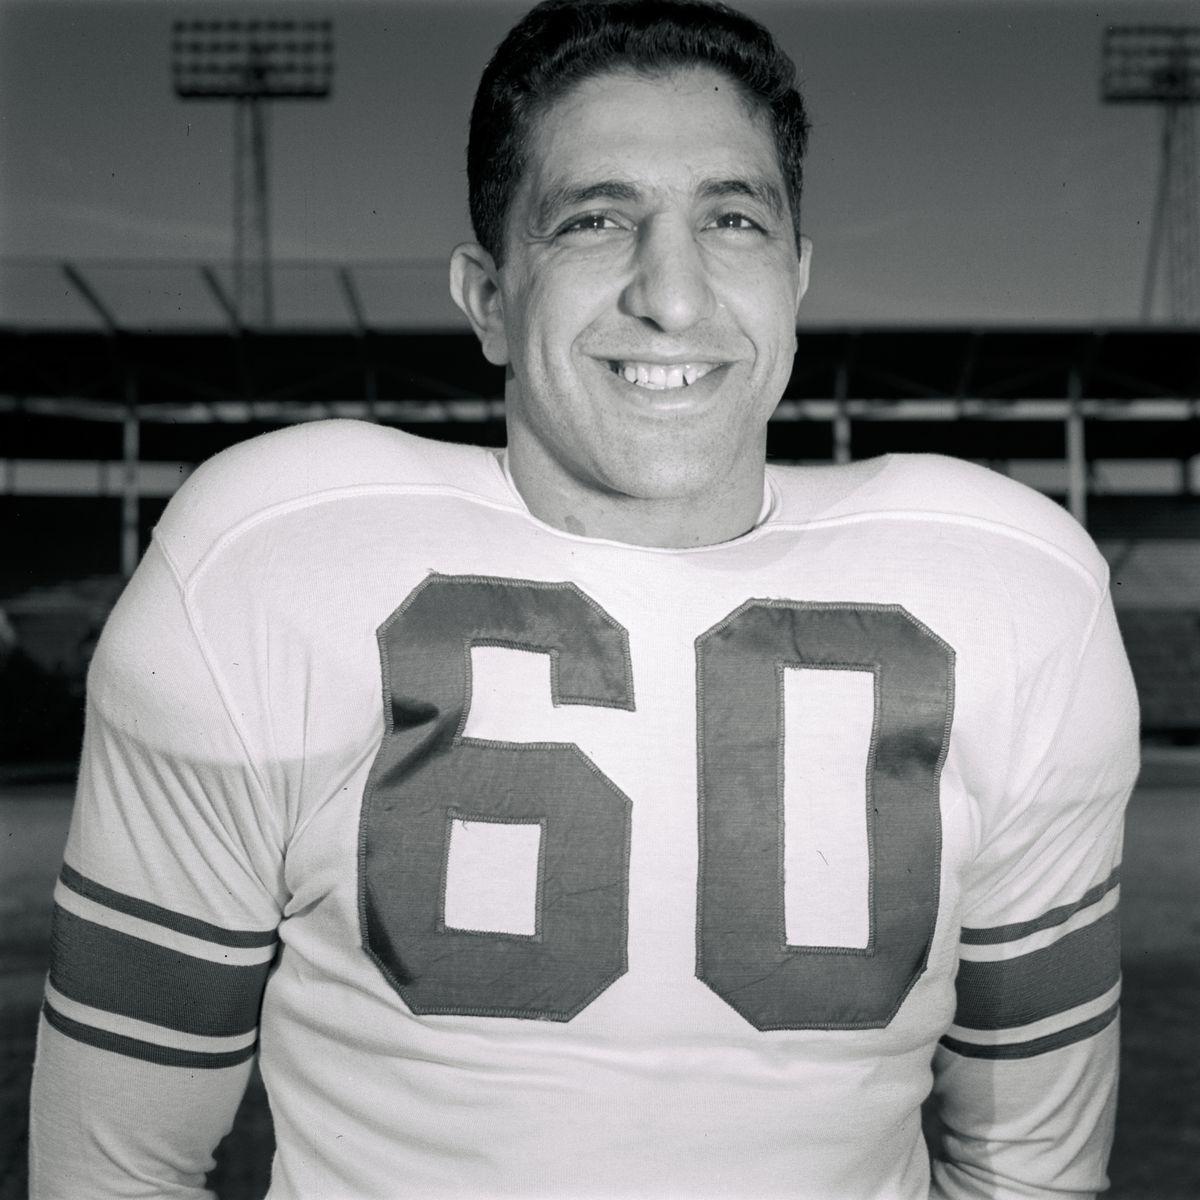 1956 NFL Pro Bowl Football Game - East vs. West